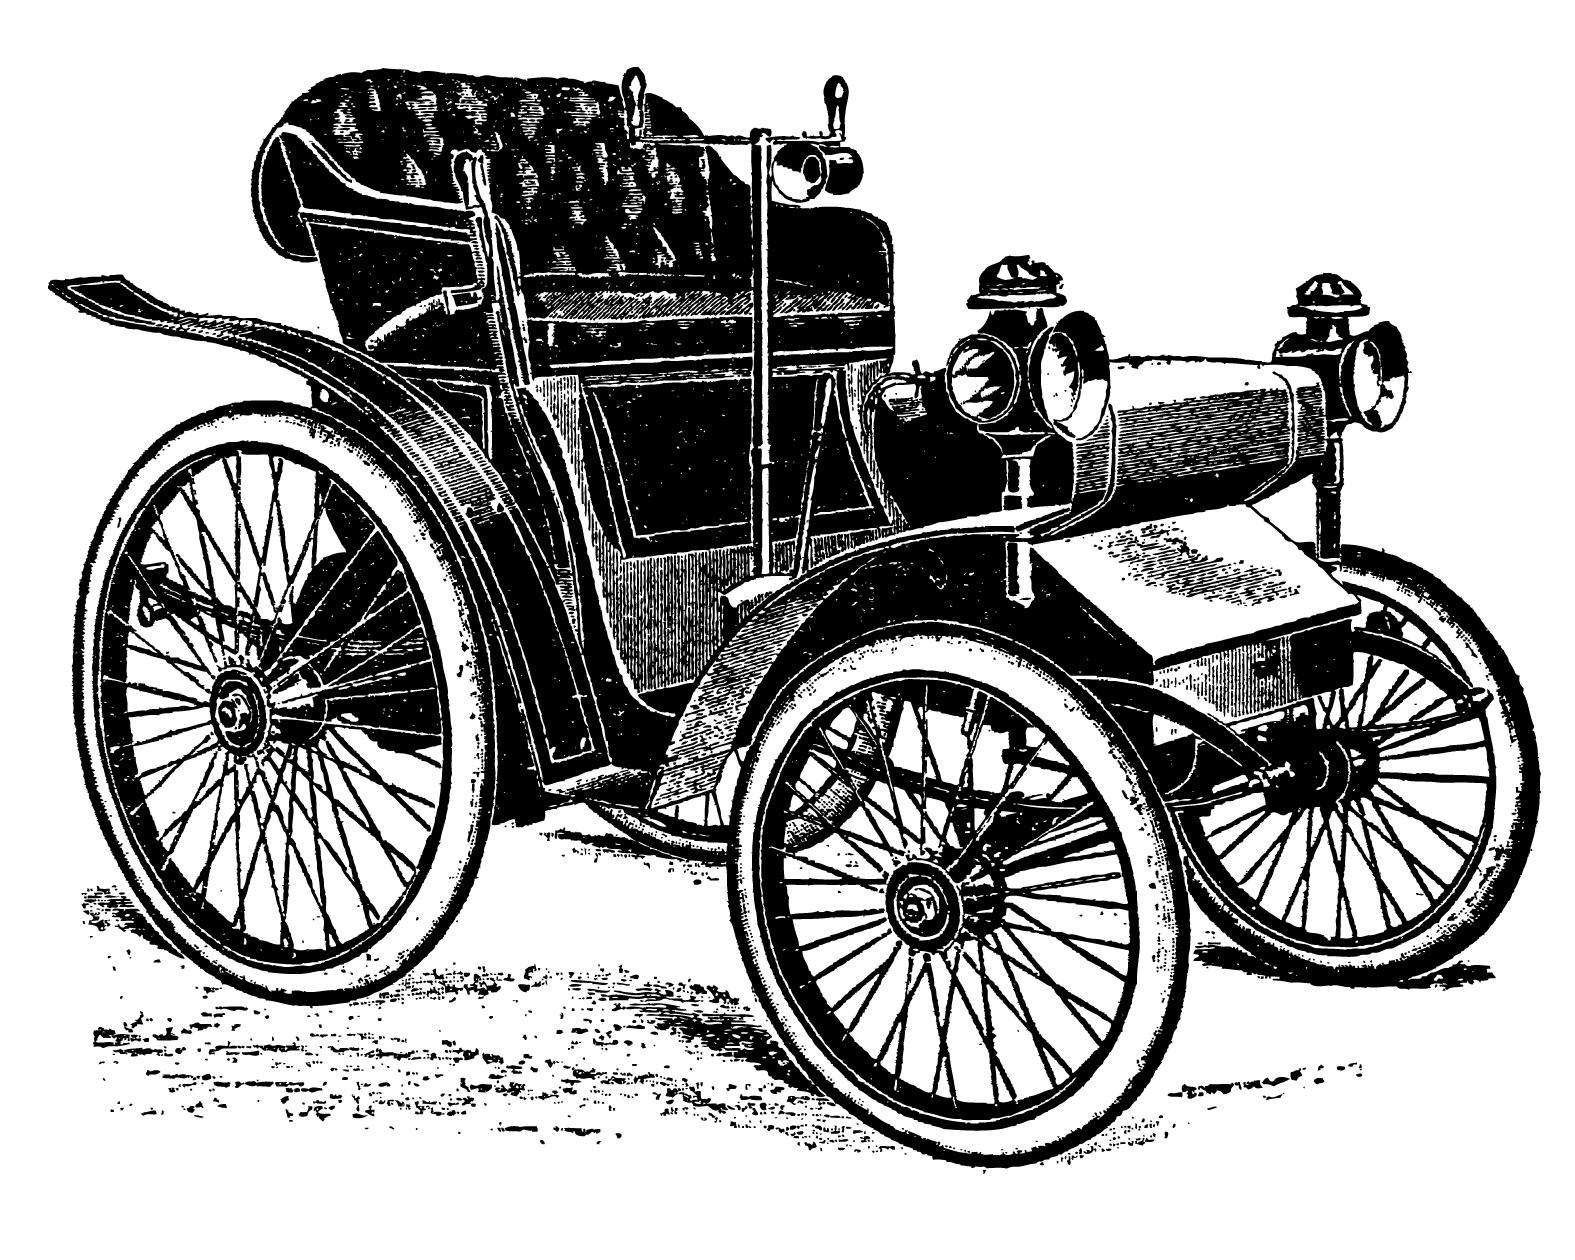 Vintage automobile clipart - Clipground